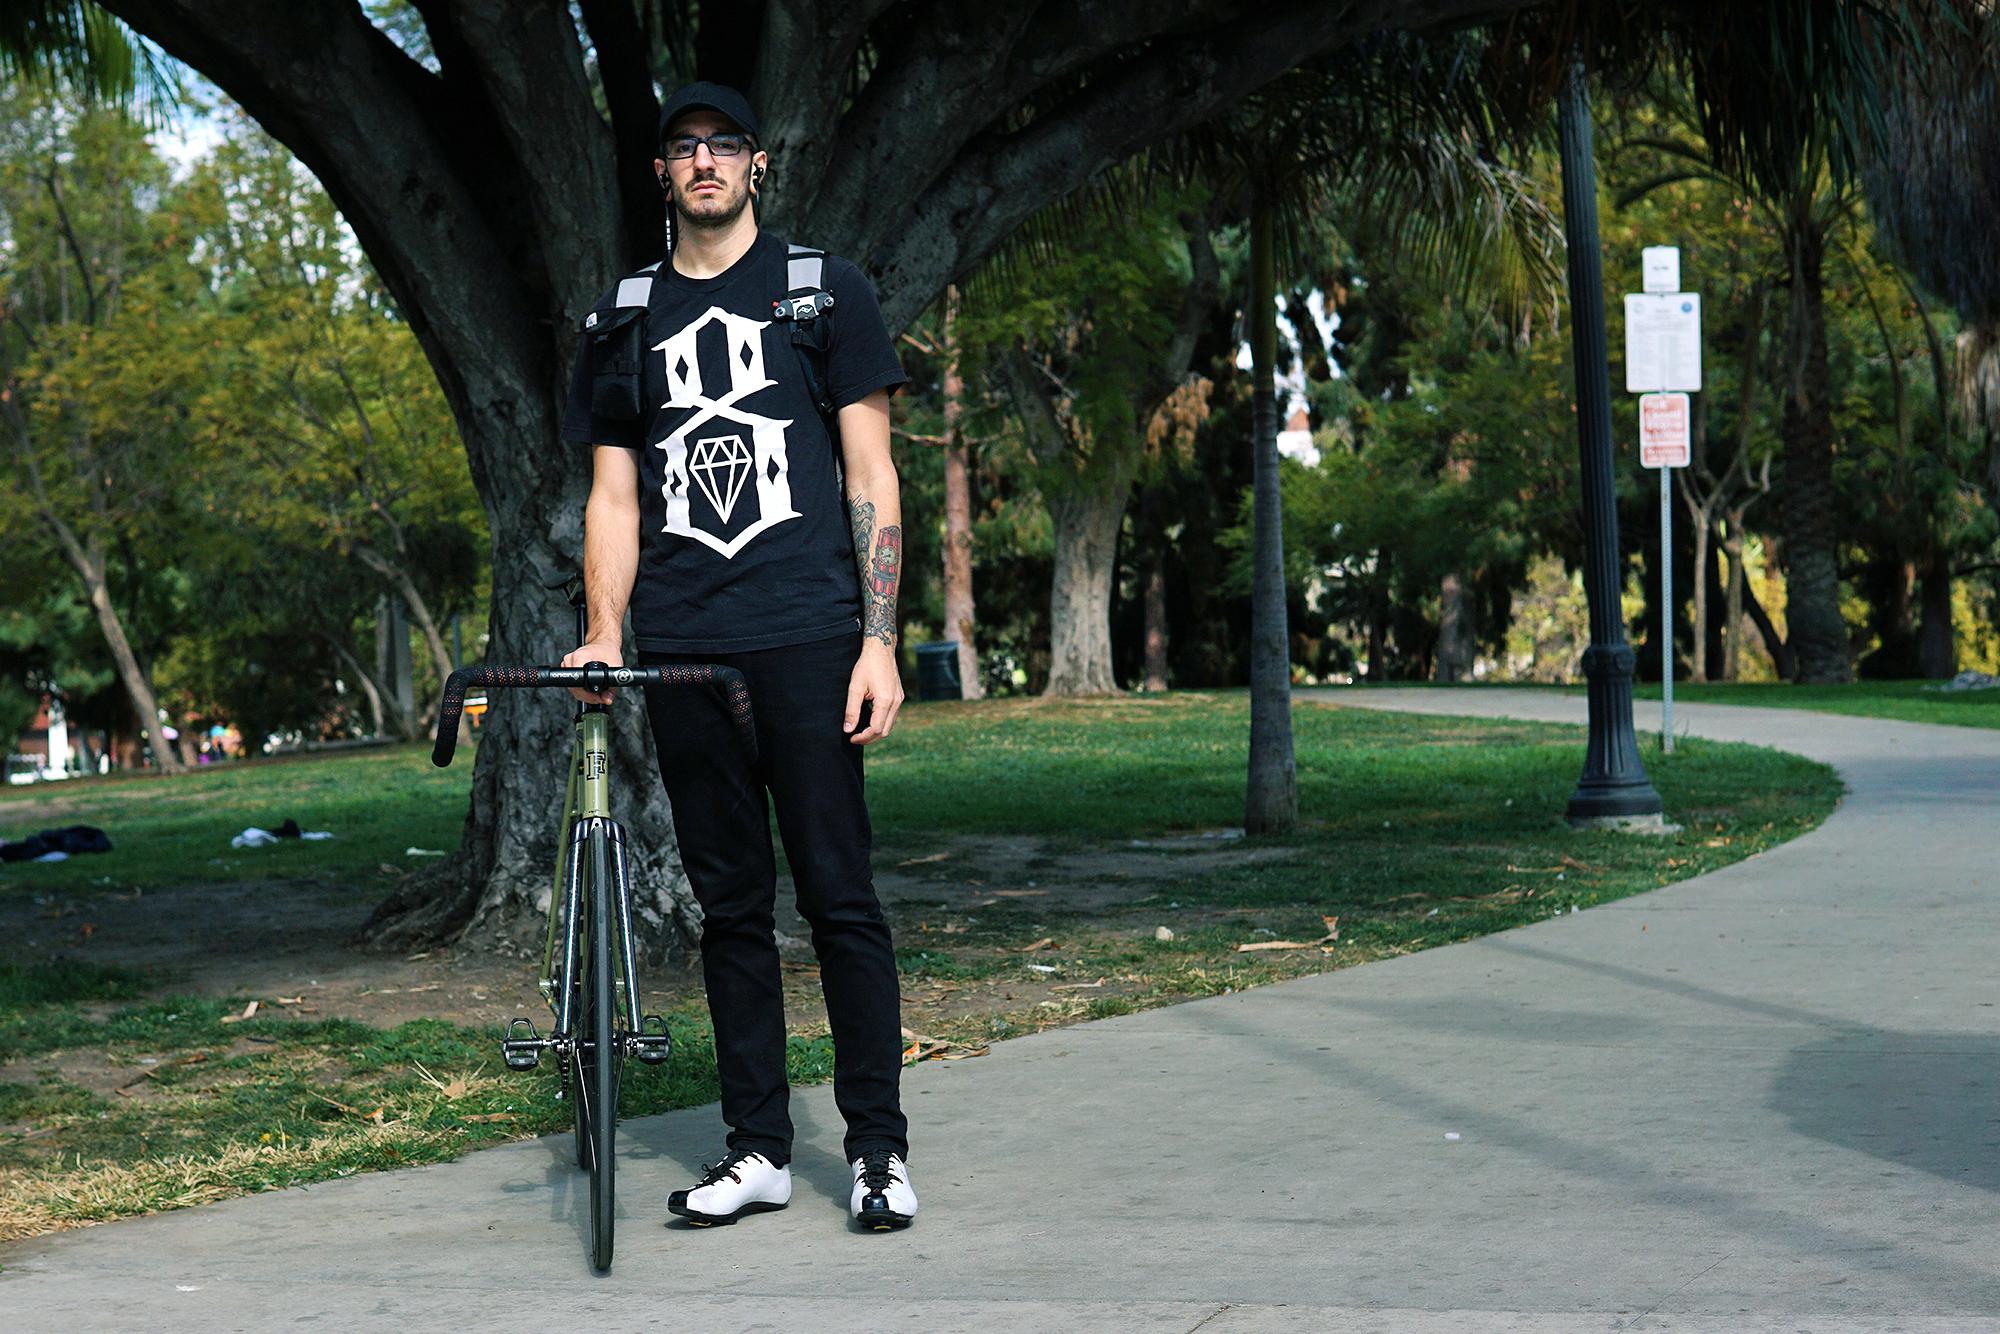 Kirk Tsonos | FWDSET - Photography & MarketingLos Angeles, Californiakirk@fwdset.com